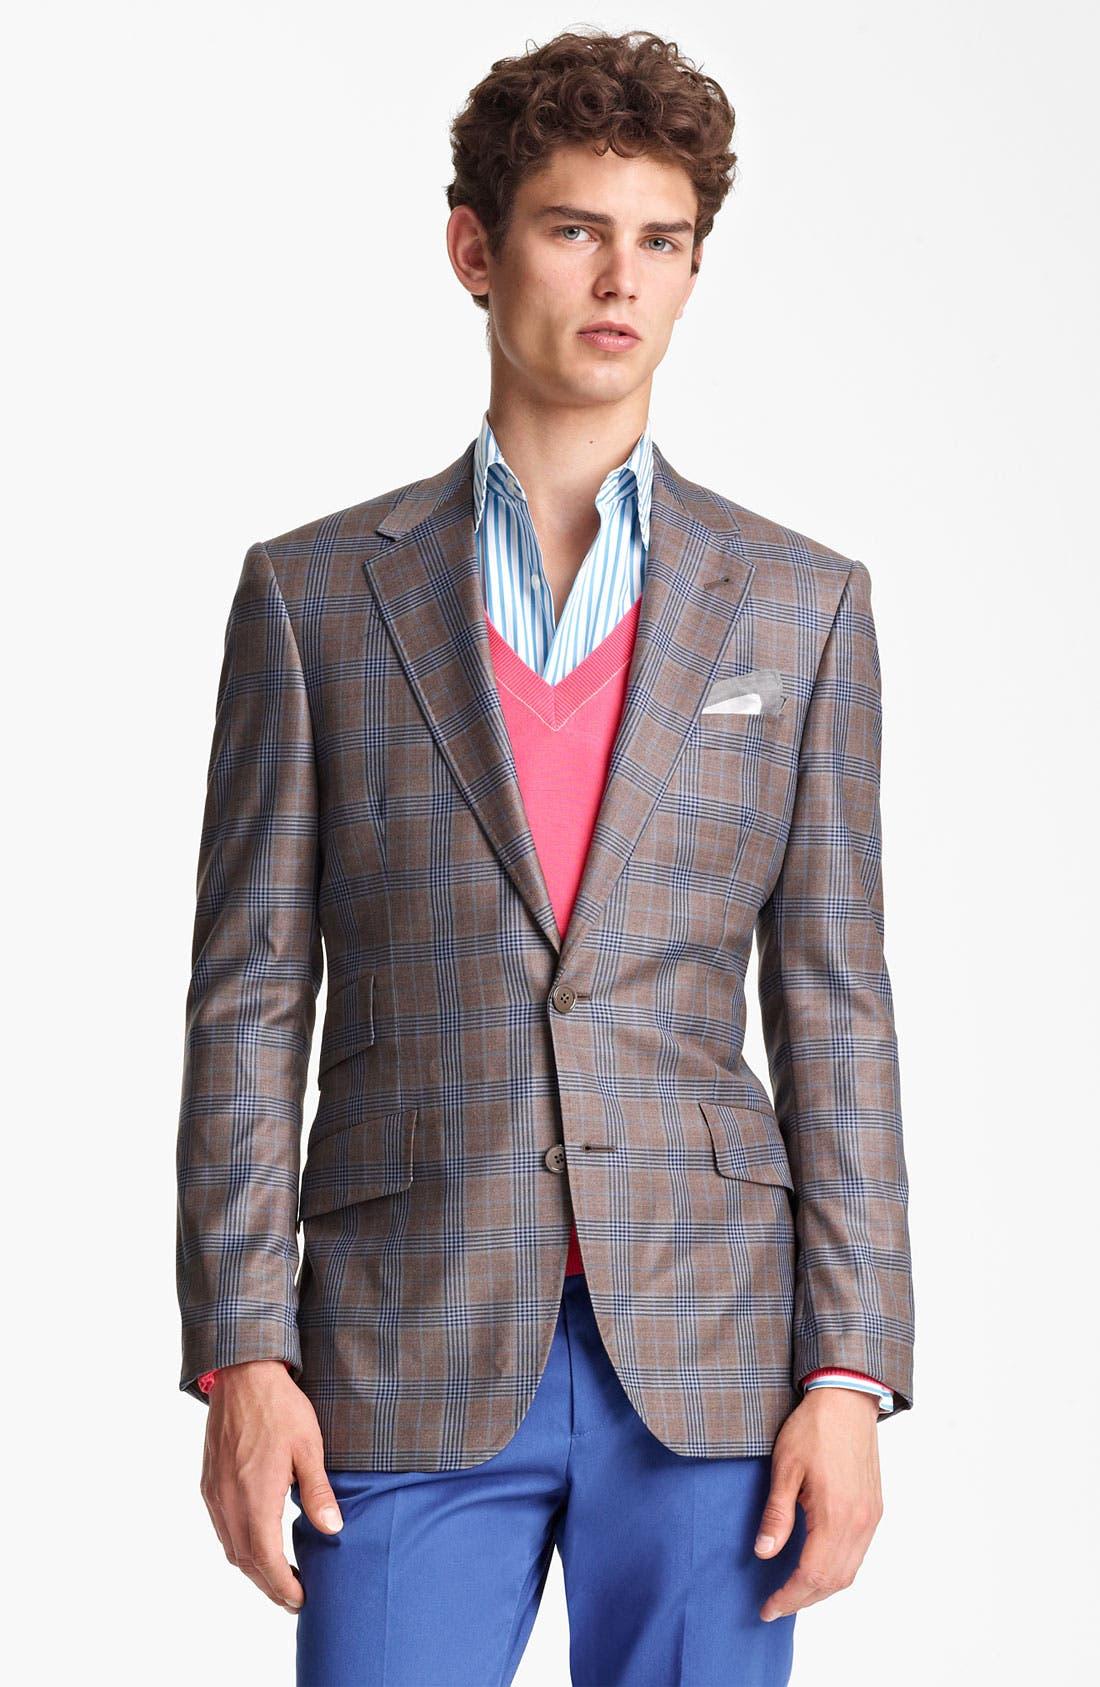 Alternate Image 1 Selected - Paul Smith London Plaid Wool Sportcoat